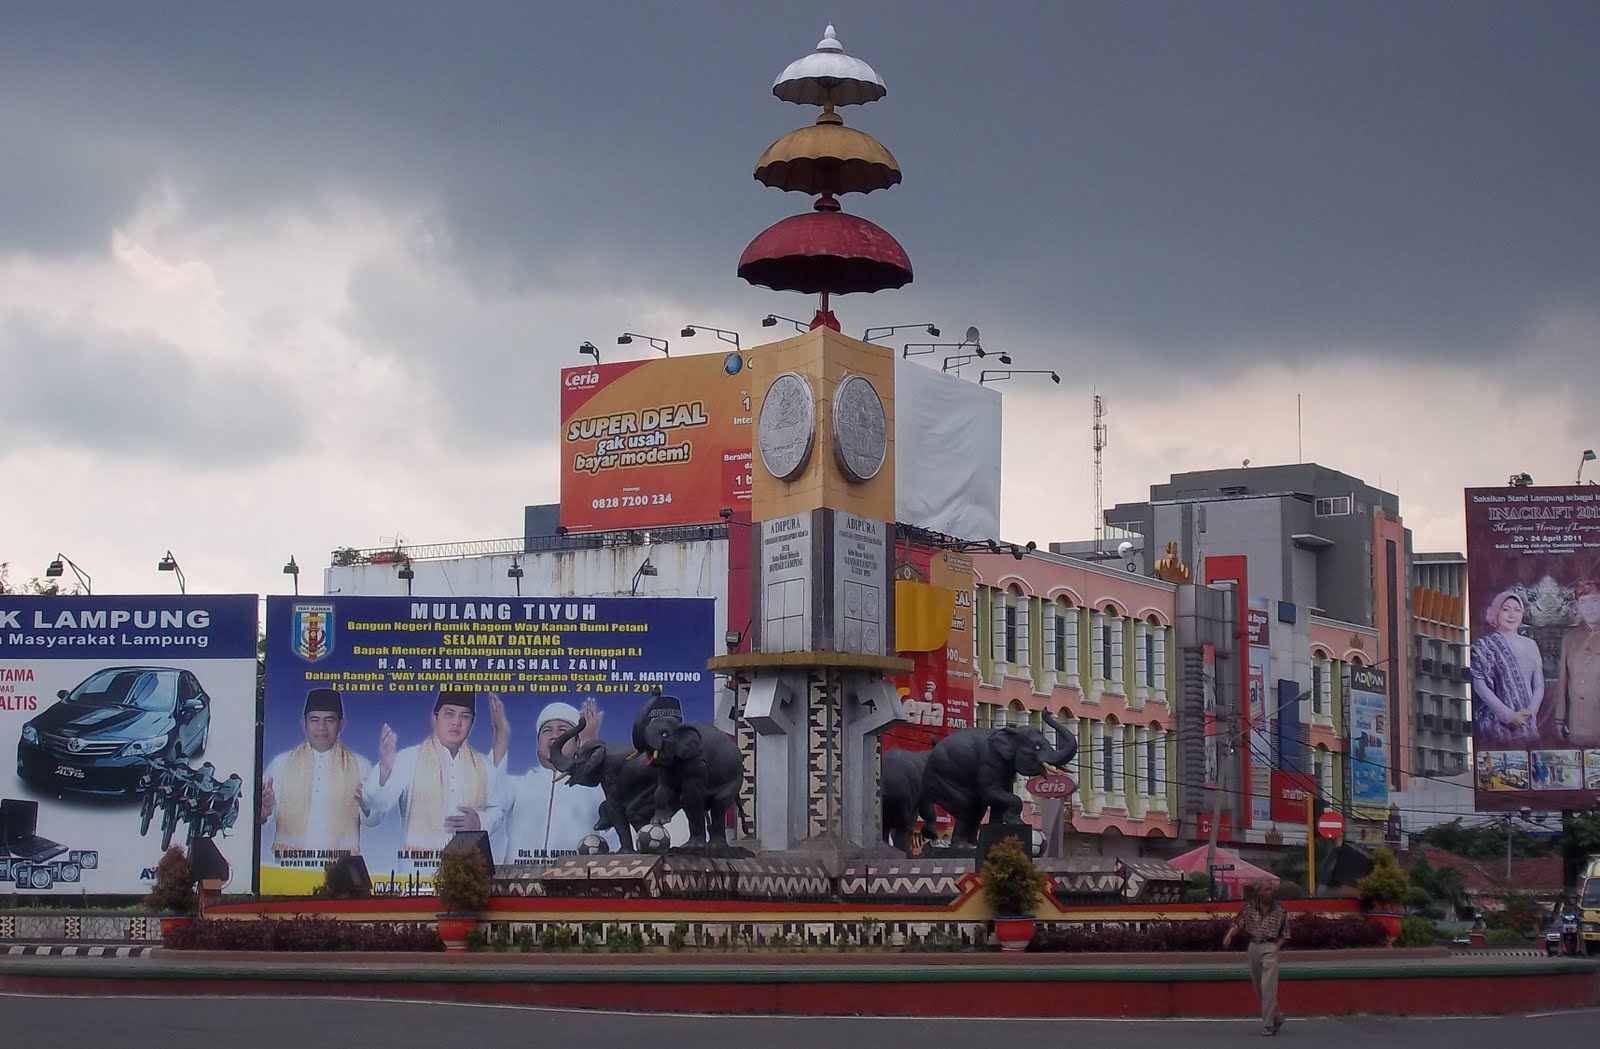 Potret Tanjung Karang Pusat Kota Bandar Lampung Dadakan Tugu Adipura